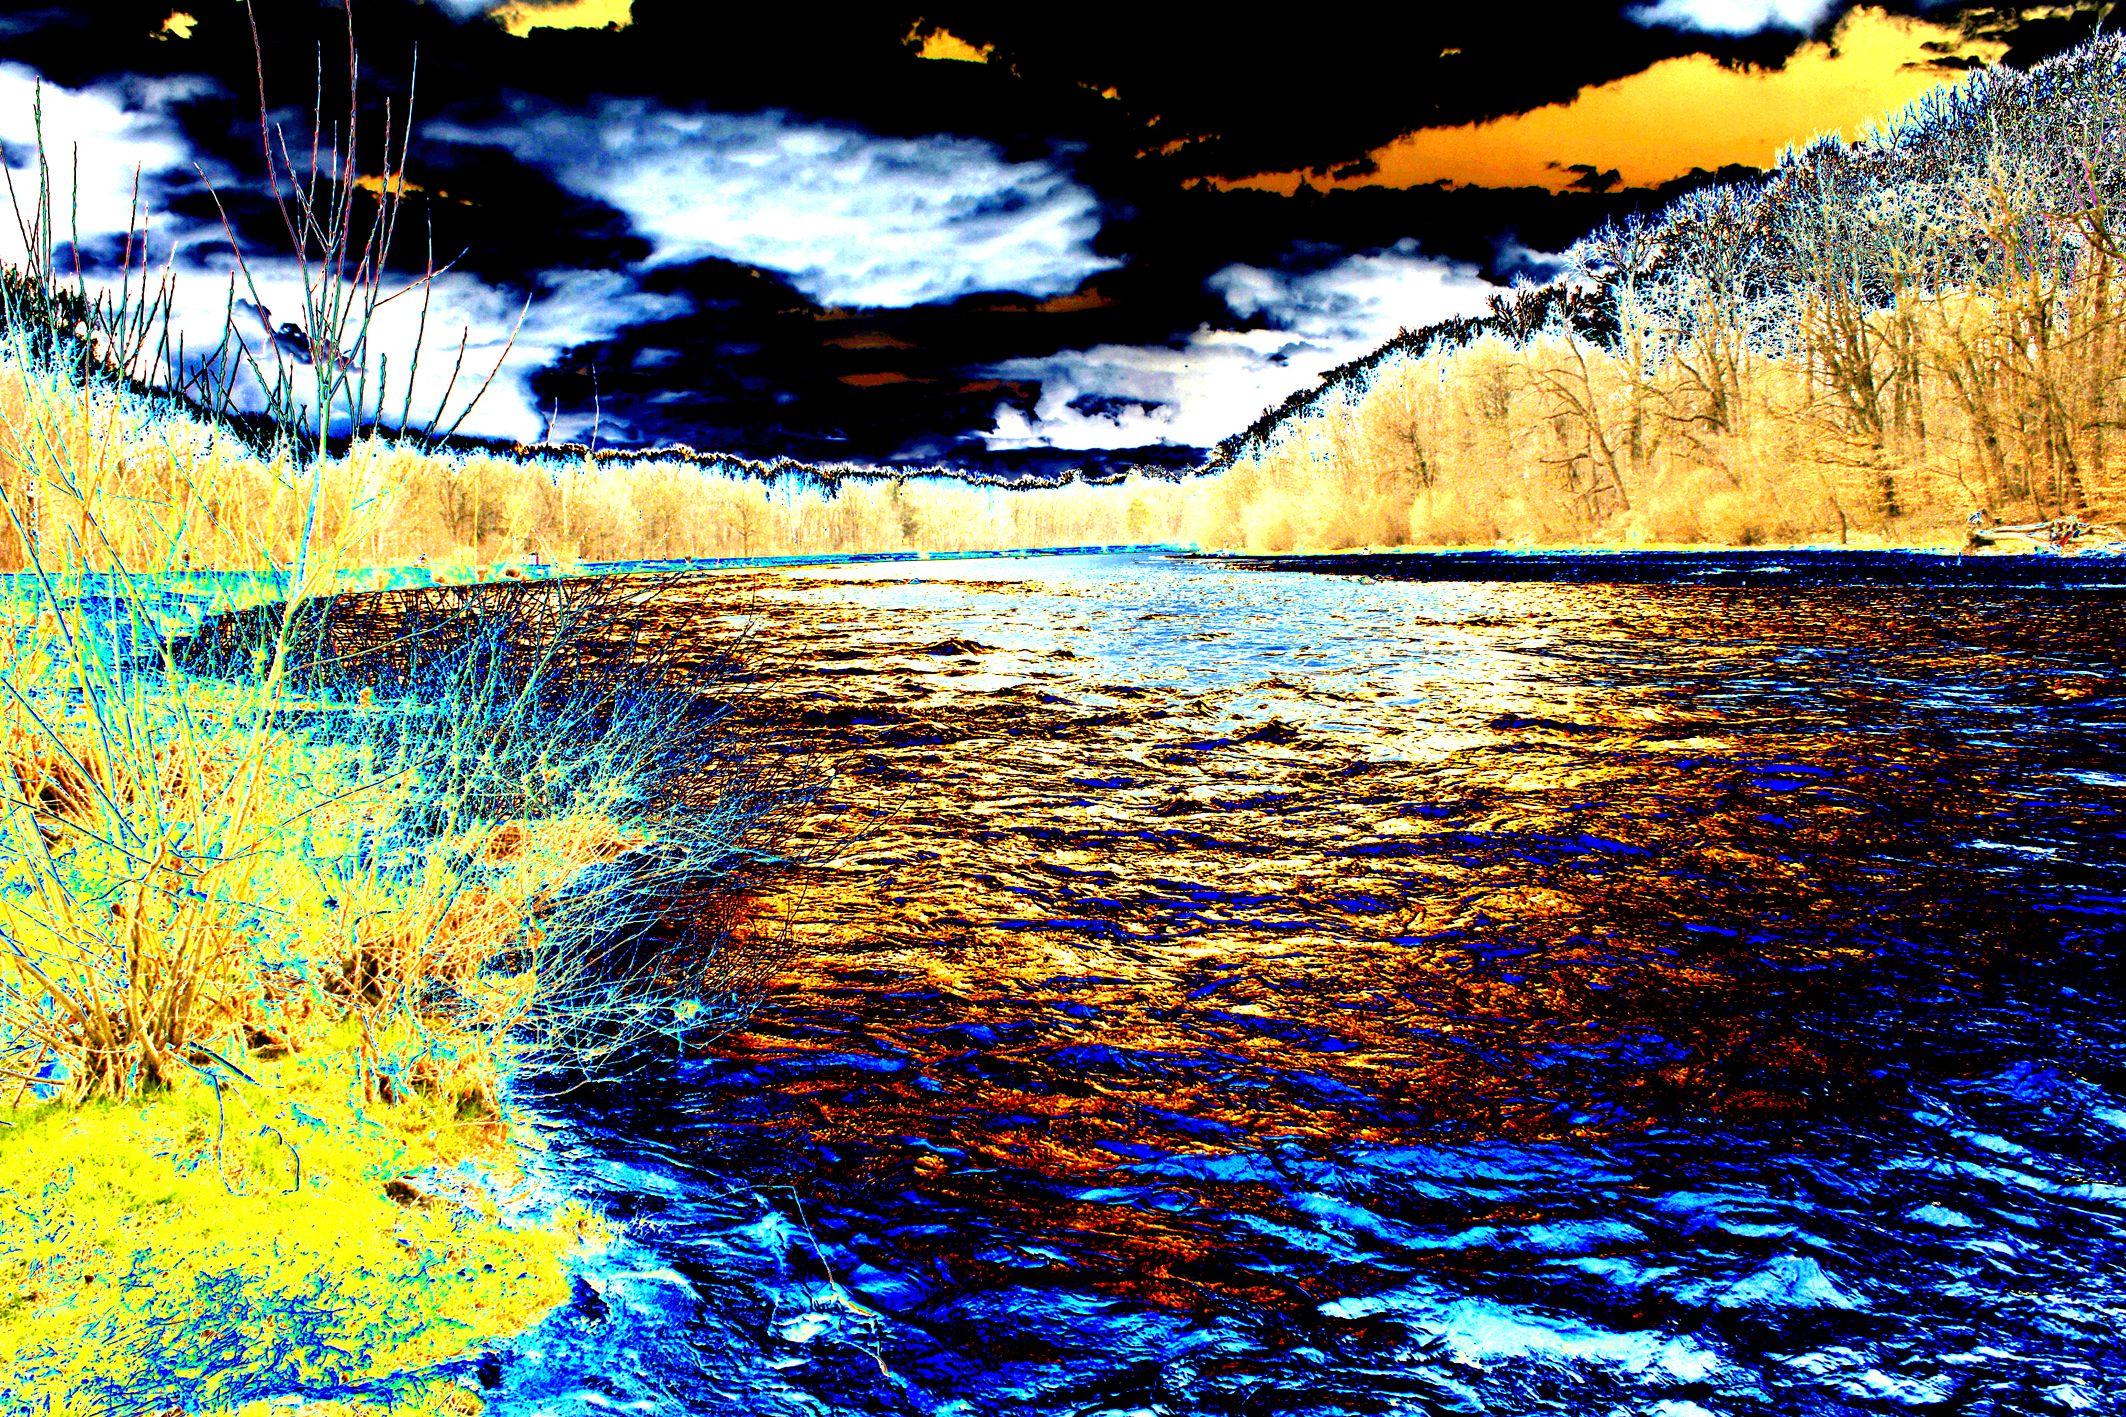 ©UGNeumann Bmb2013-27naa